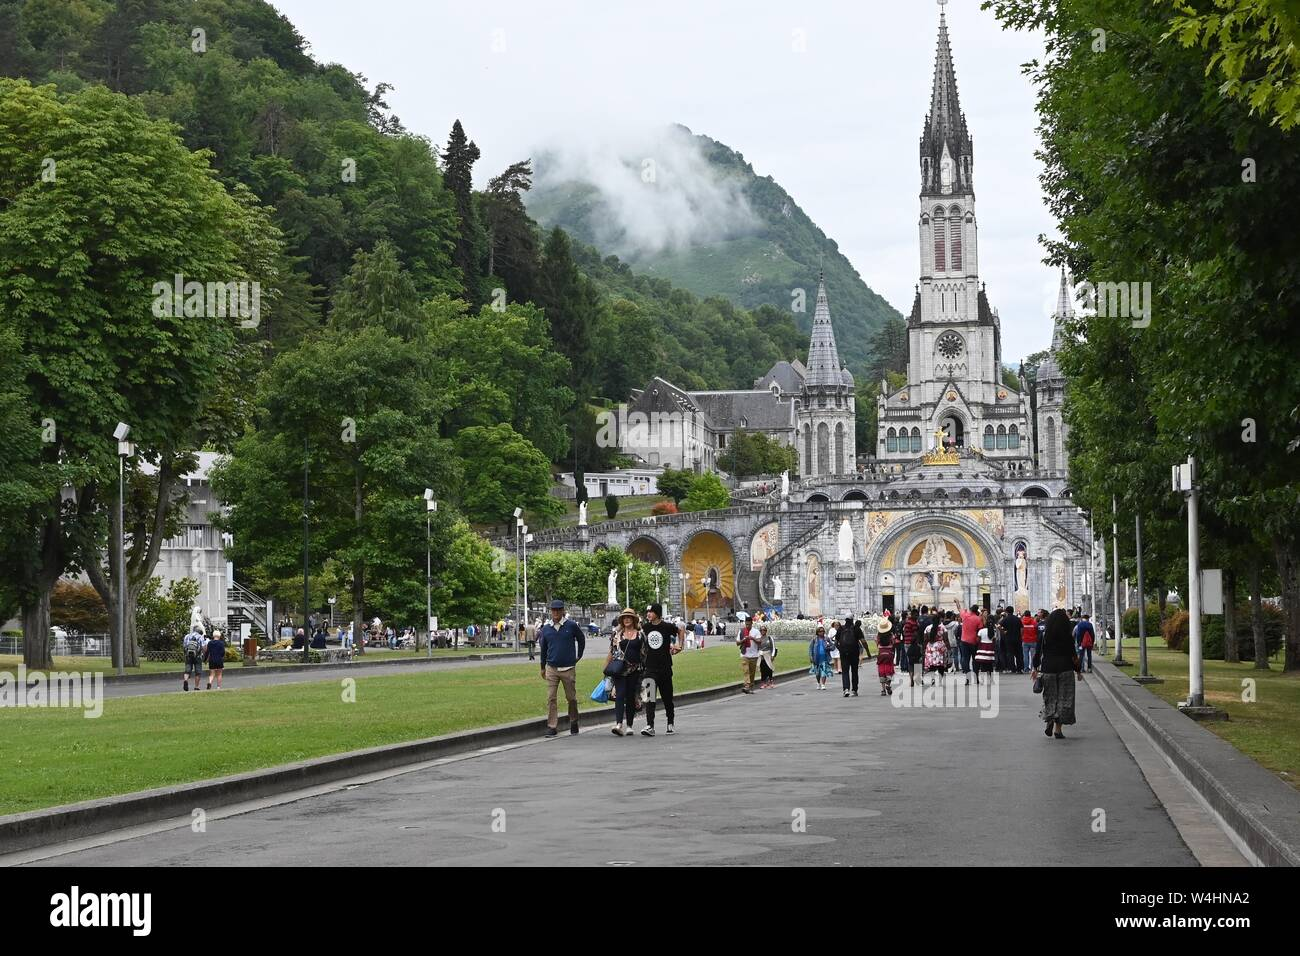 ihe basilicas in Lourdes, France Stock Photo